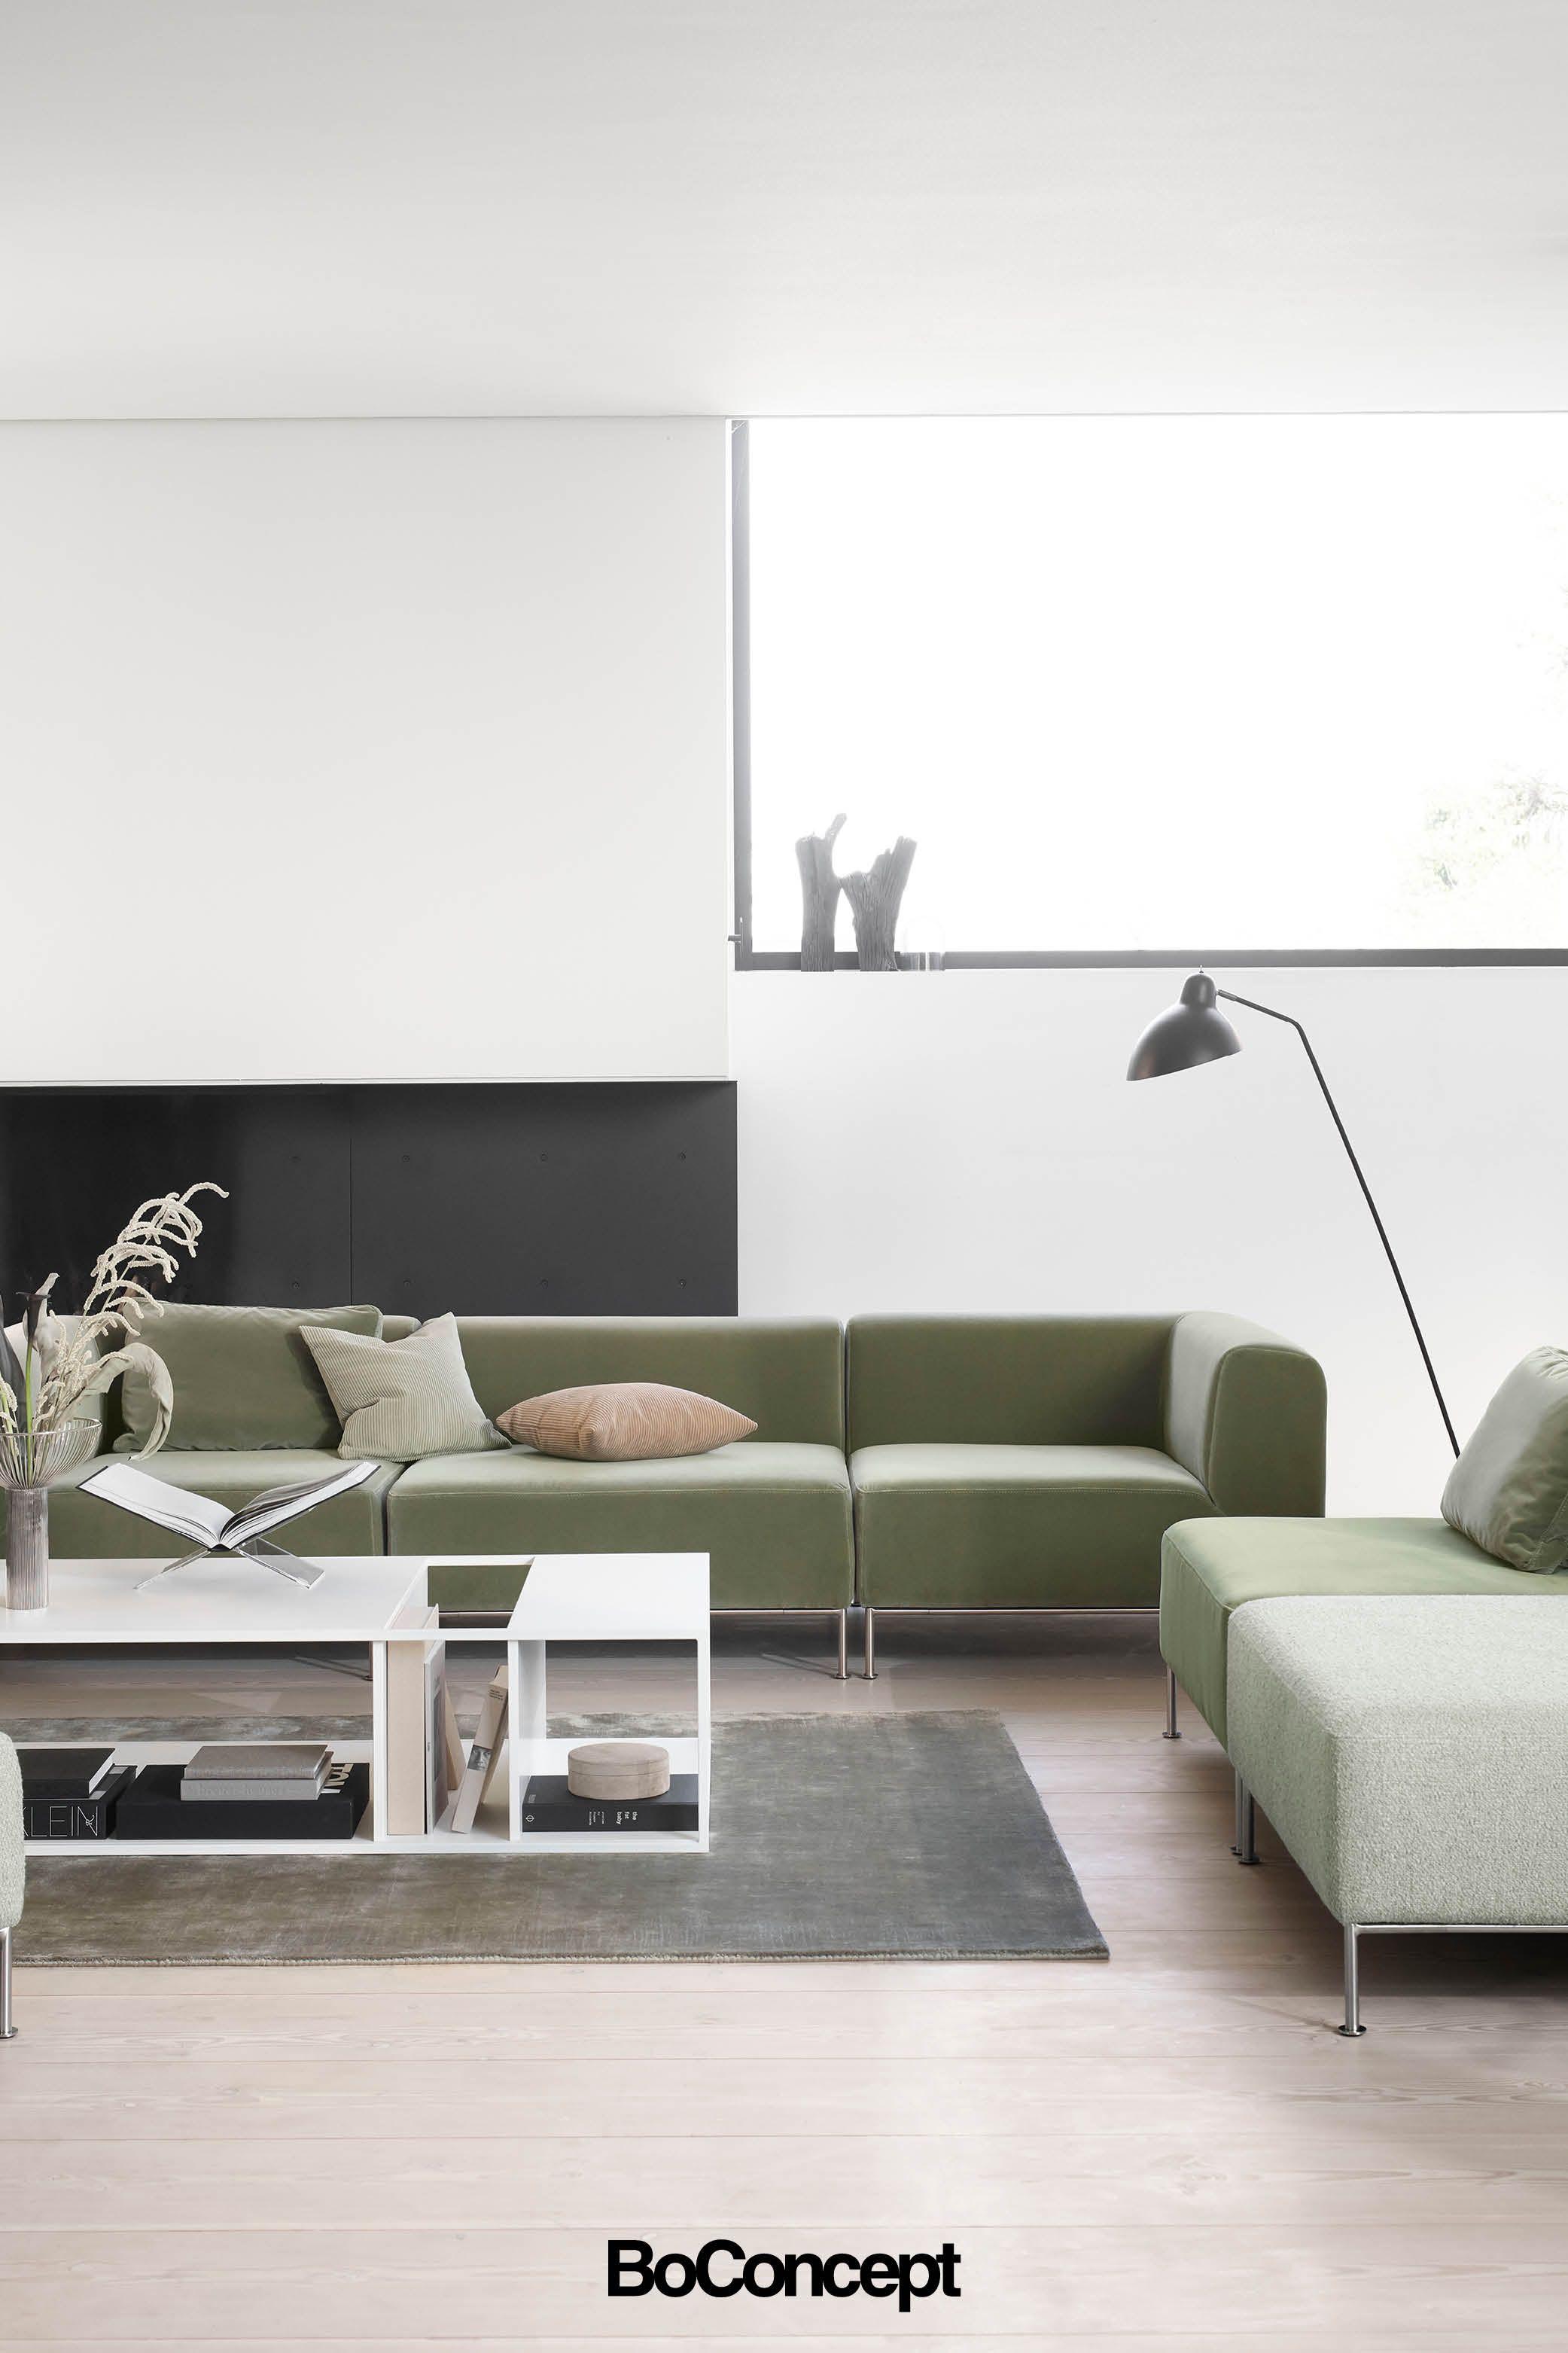 New In Miami Corner Seat Furniture Furniture Design Living Room Designs